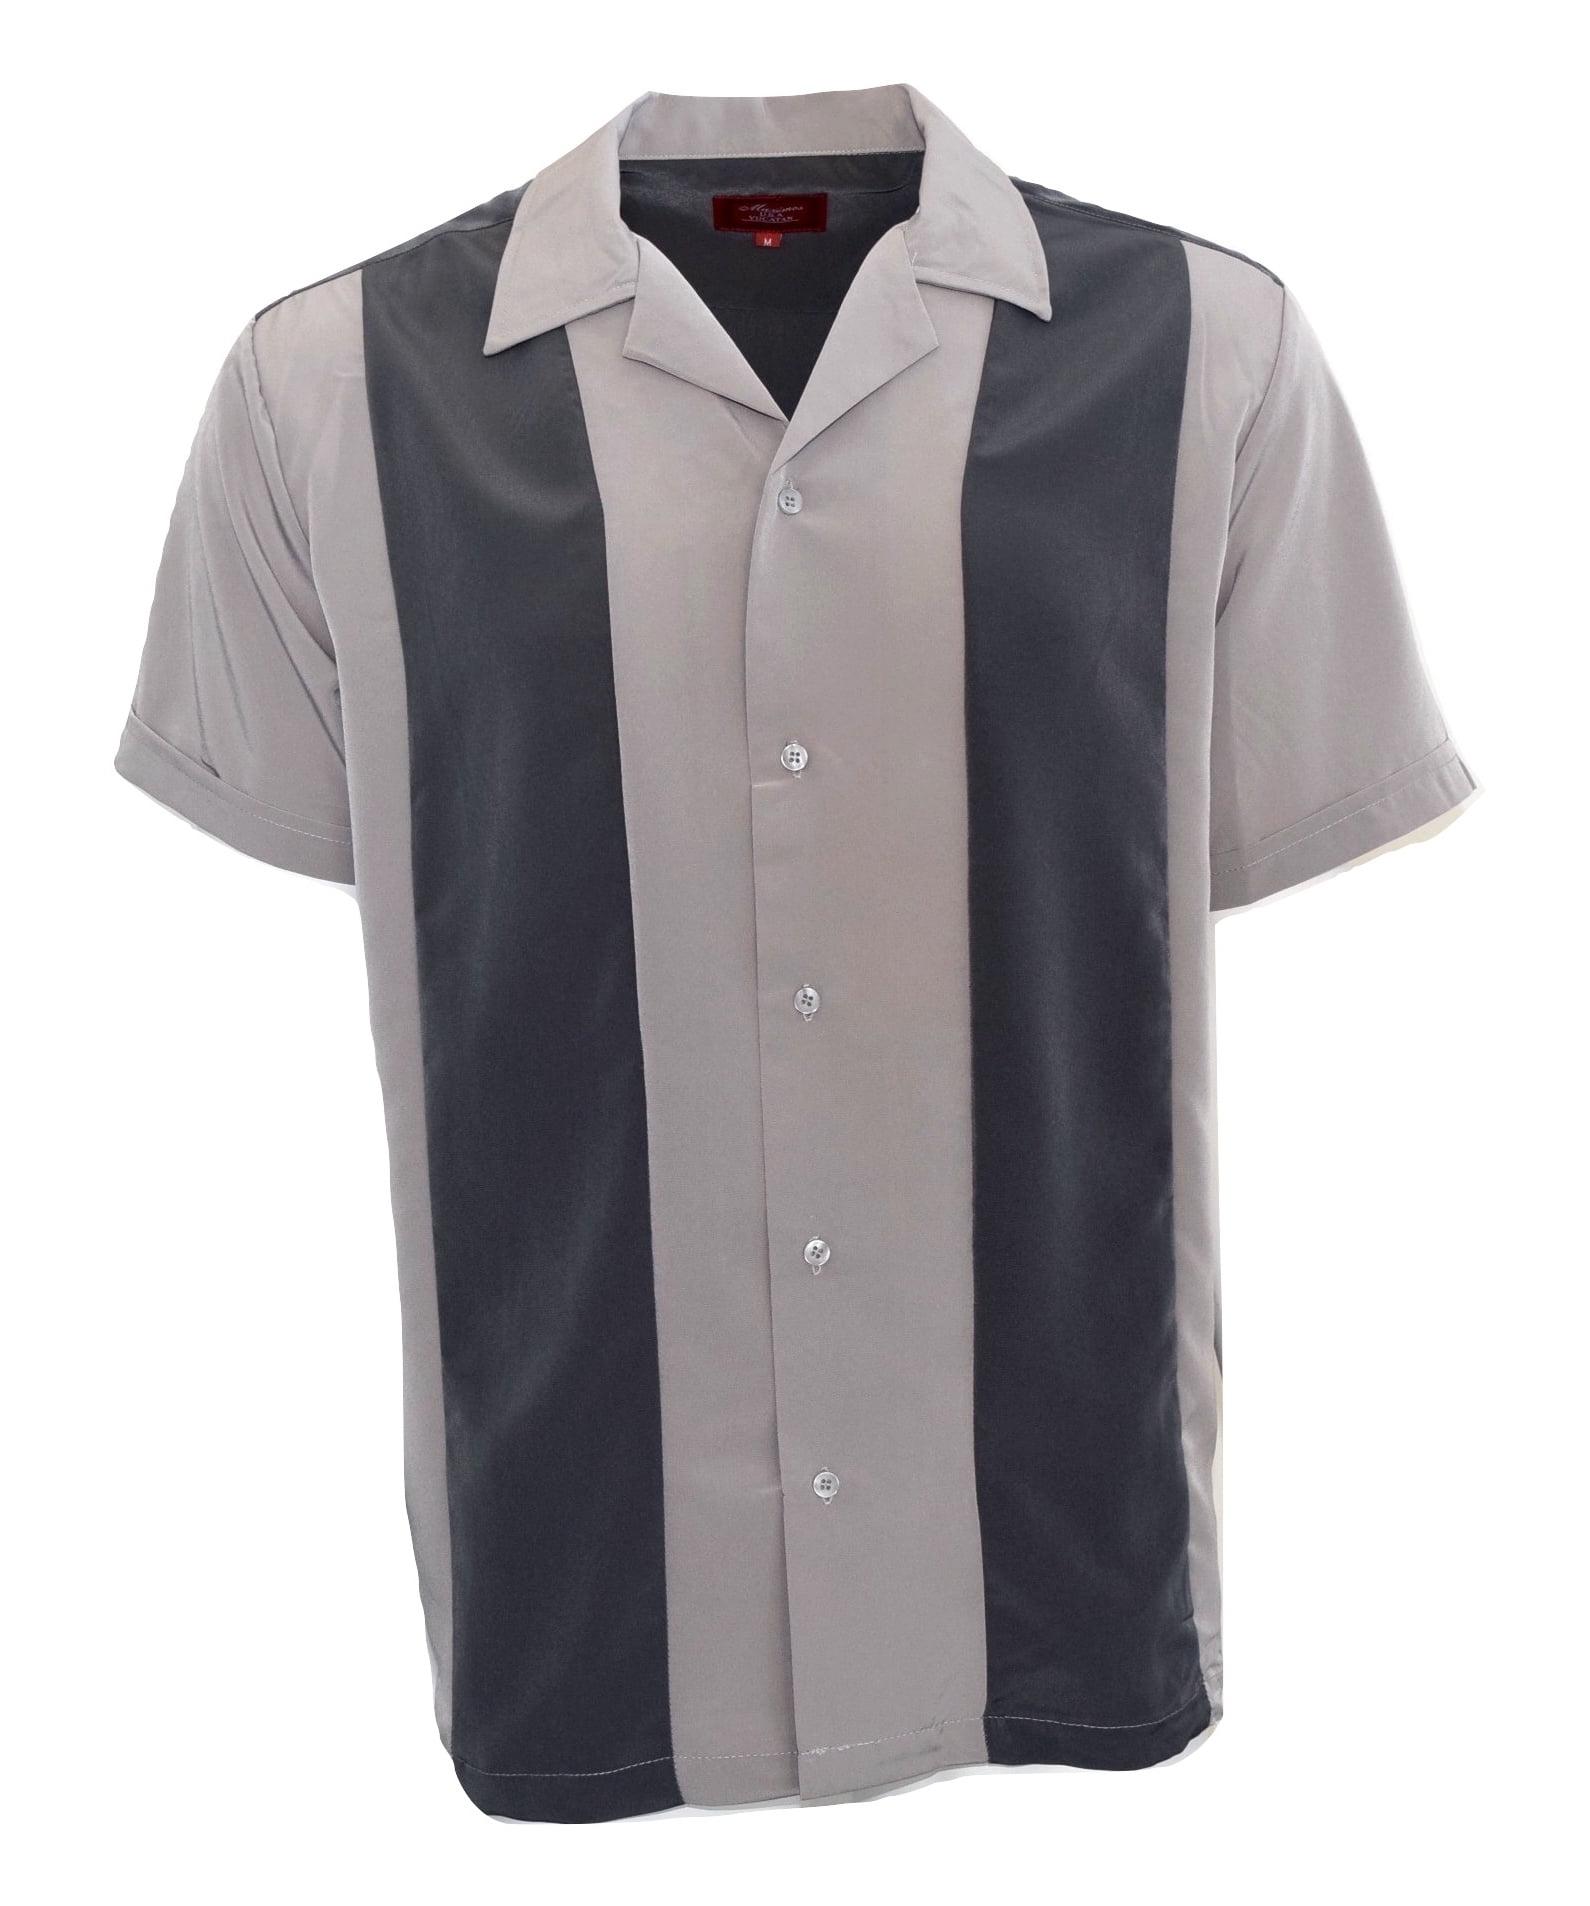 Mens Shirts Vintage Coffee Bowling Shirts Button Down Shirts